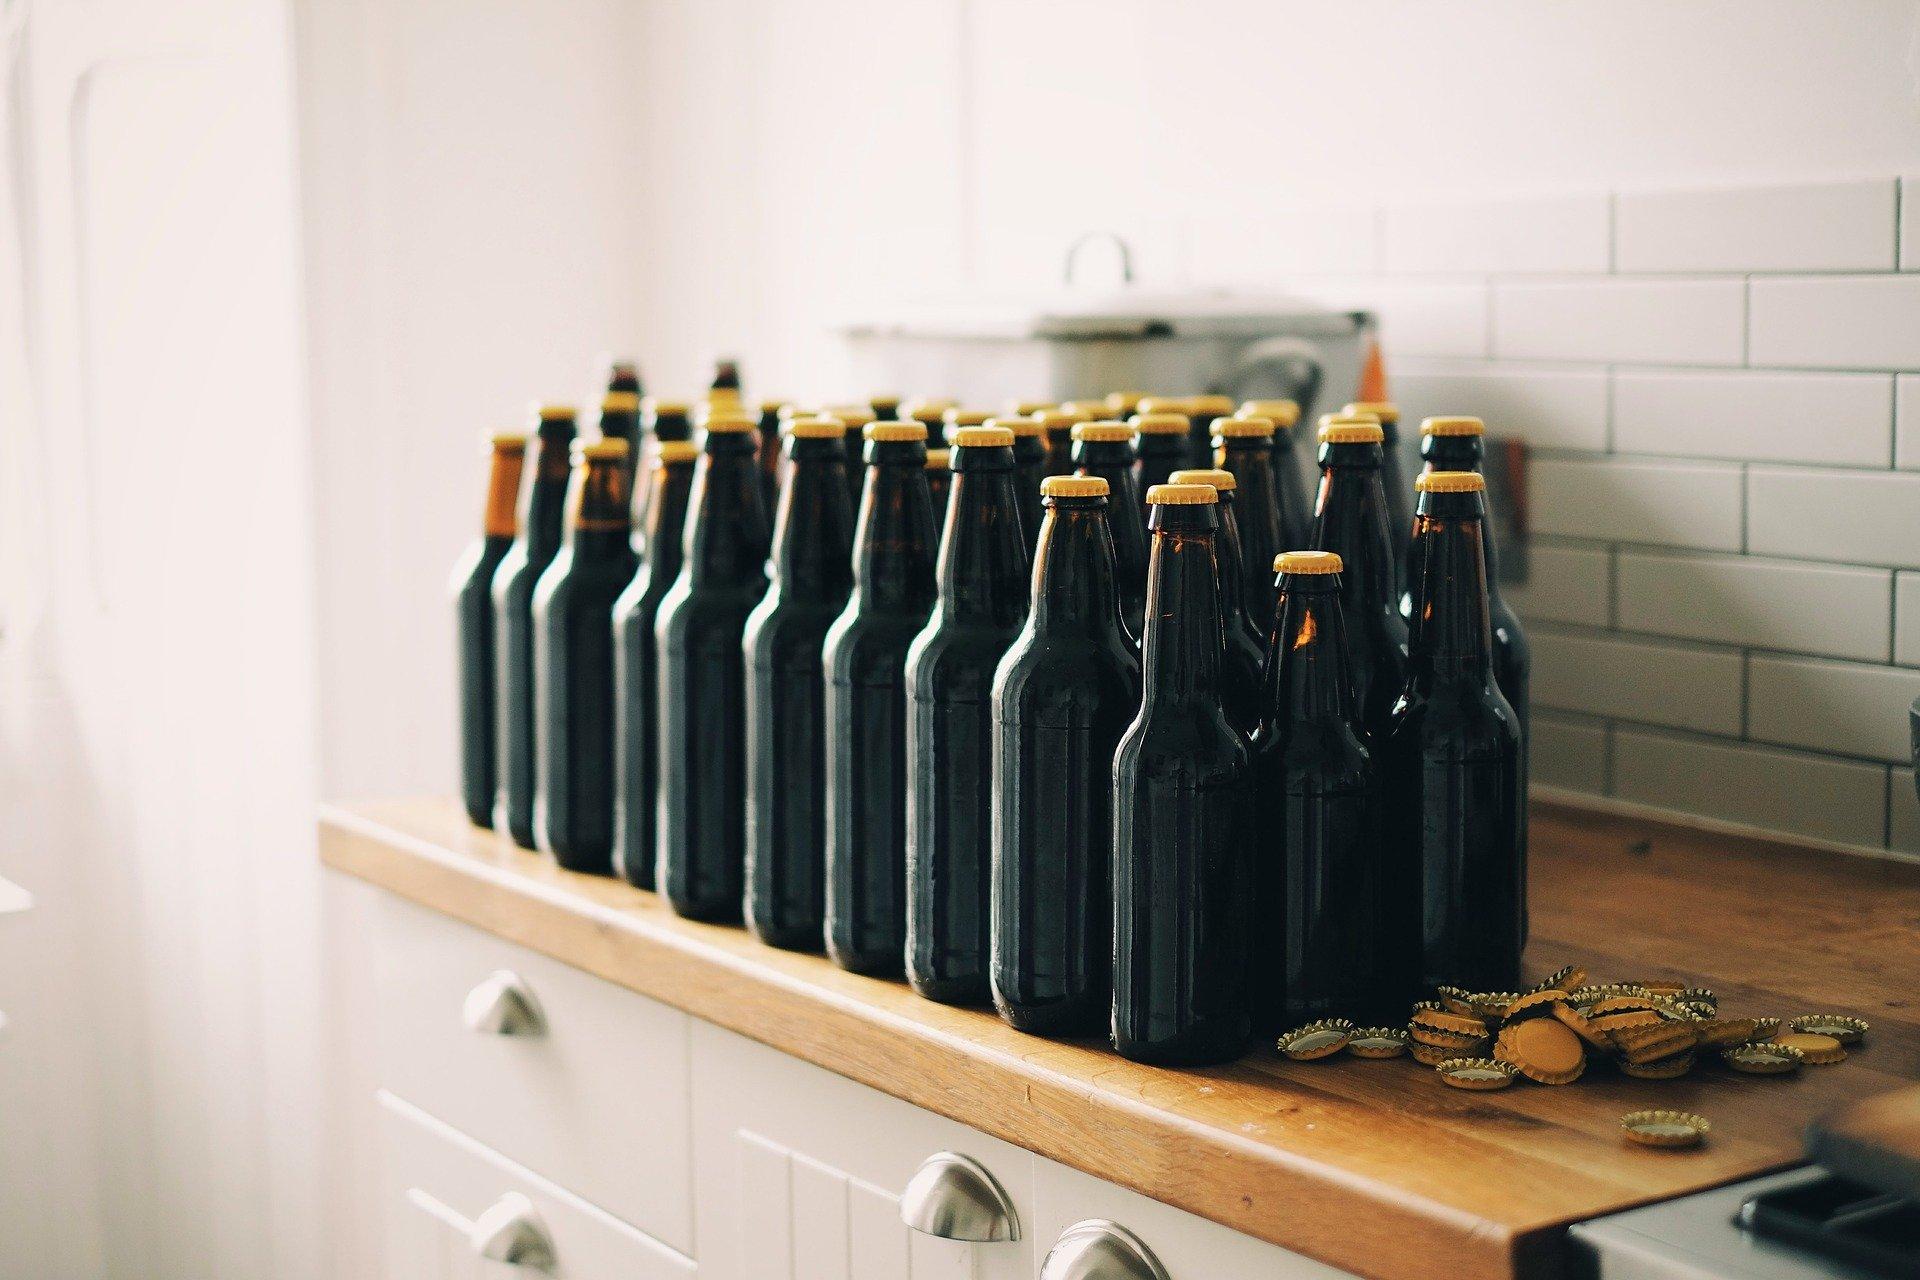 beer bottles on counter